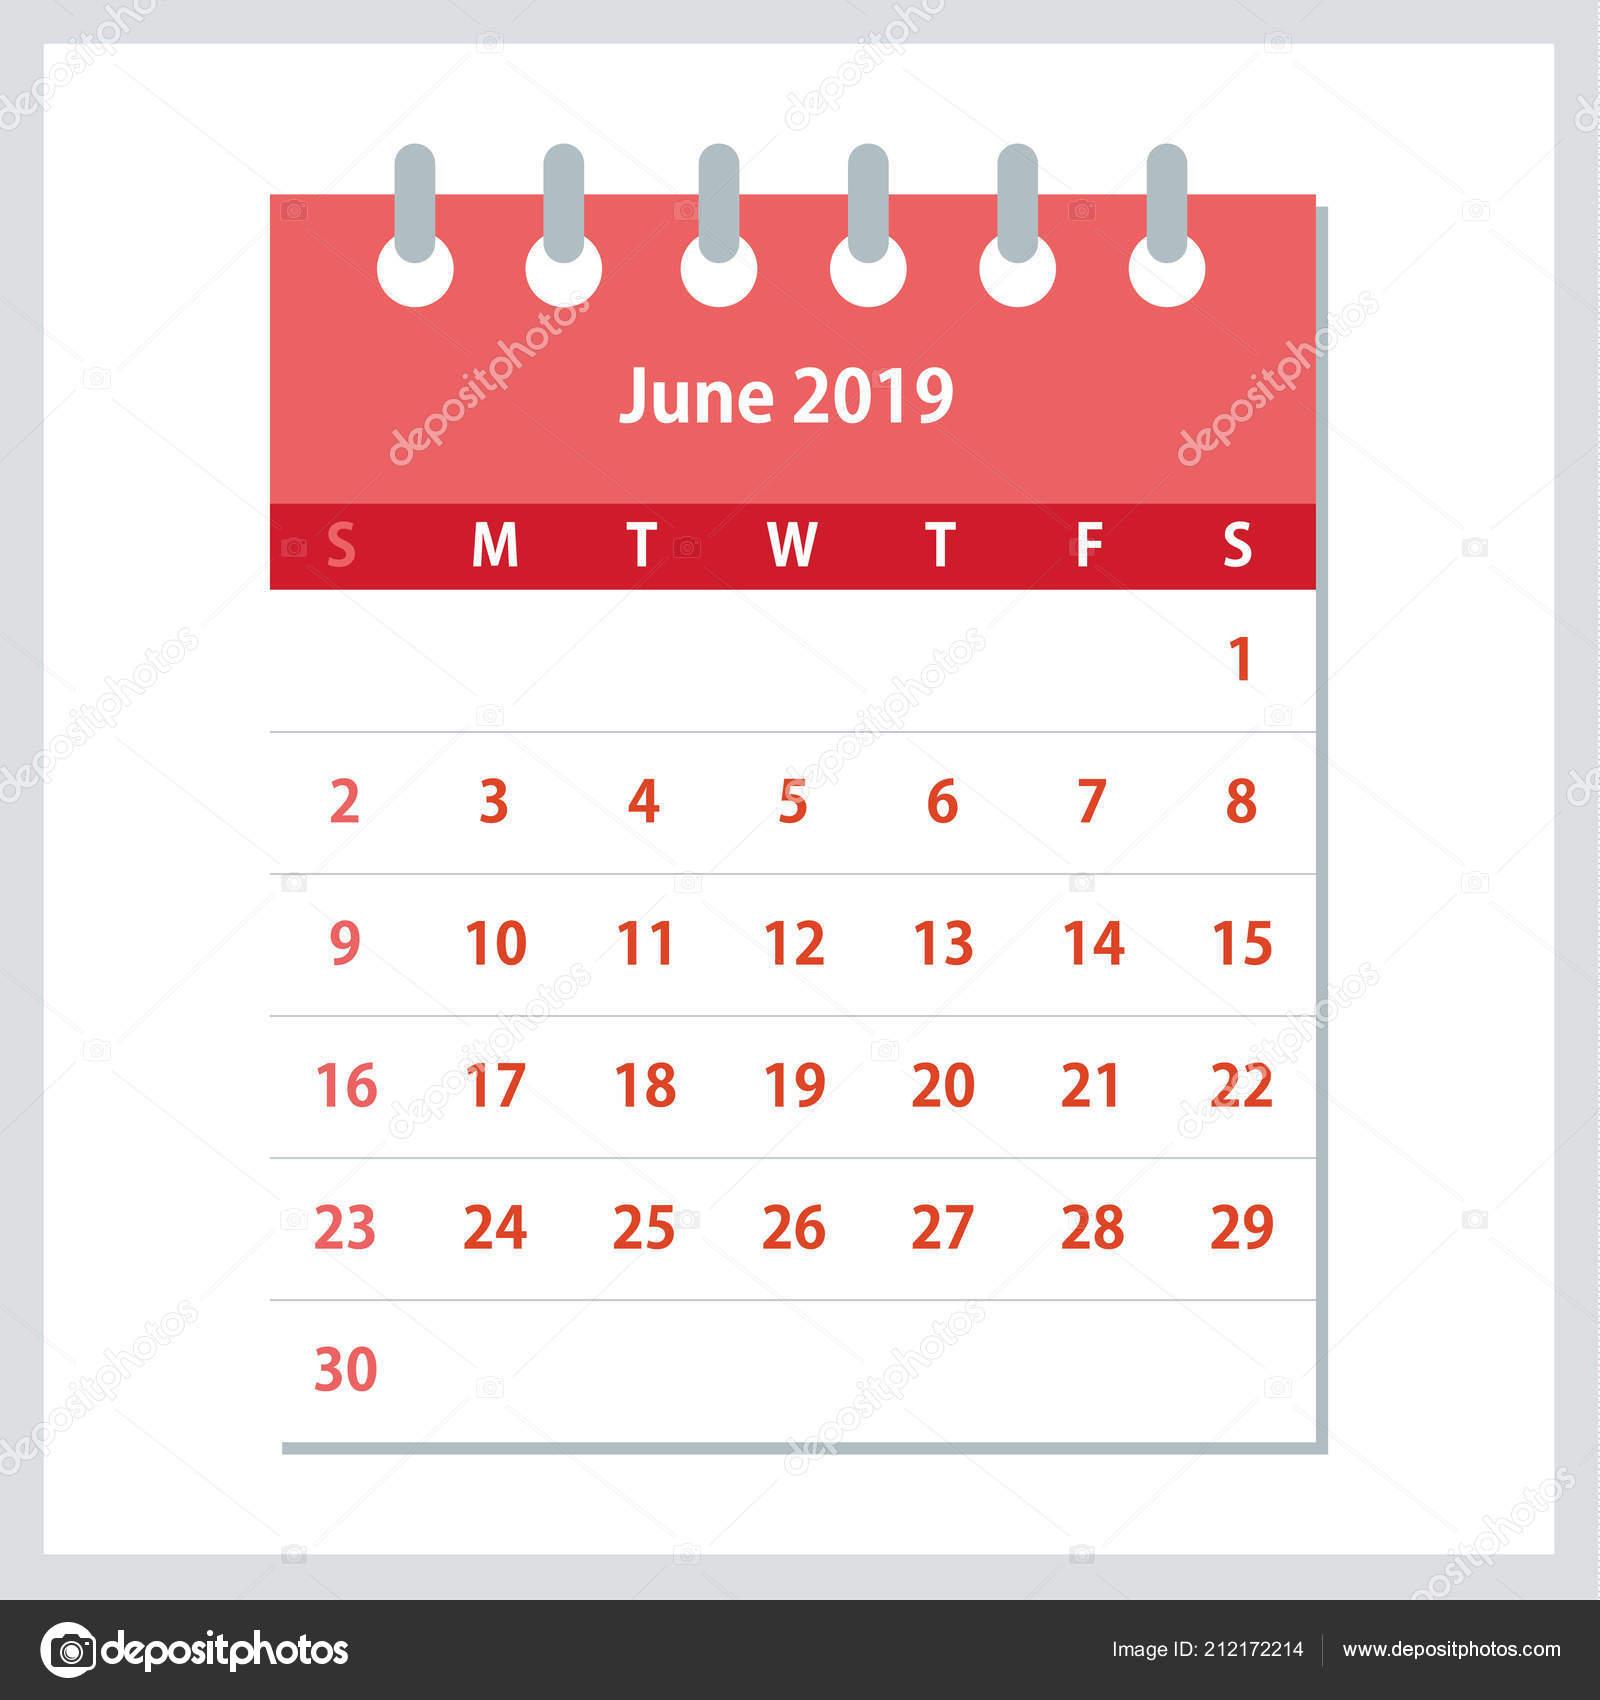 Semana Calendario.Hoja Calendario Junio 2019 Plantilla Diseno Calendario Mensual